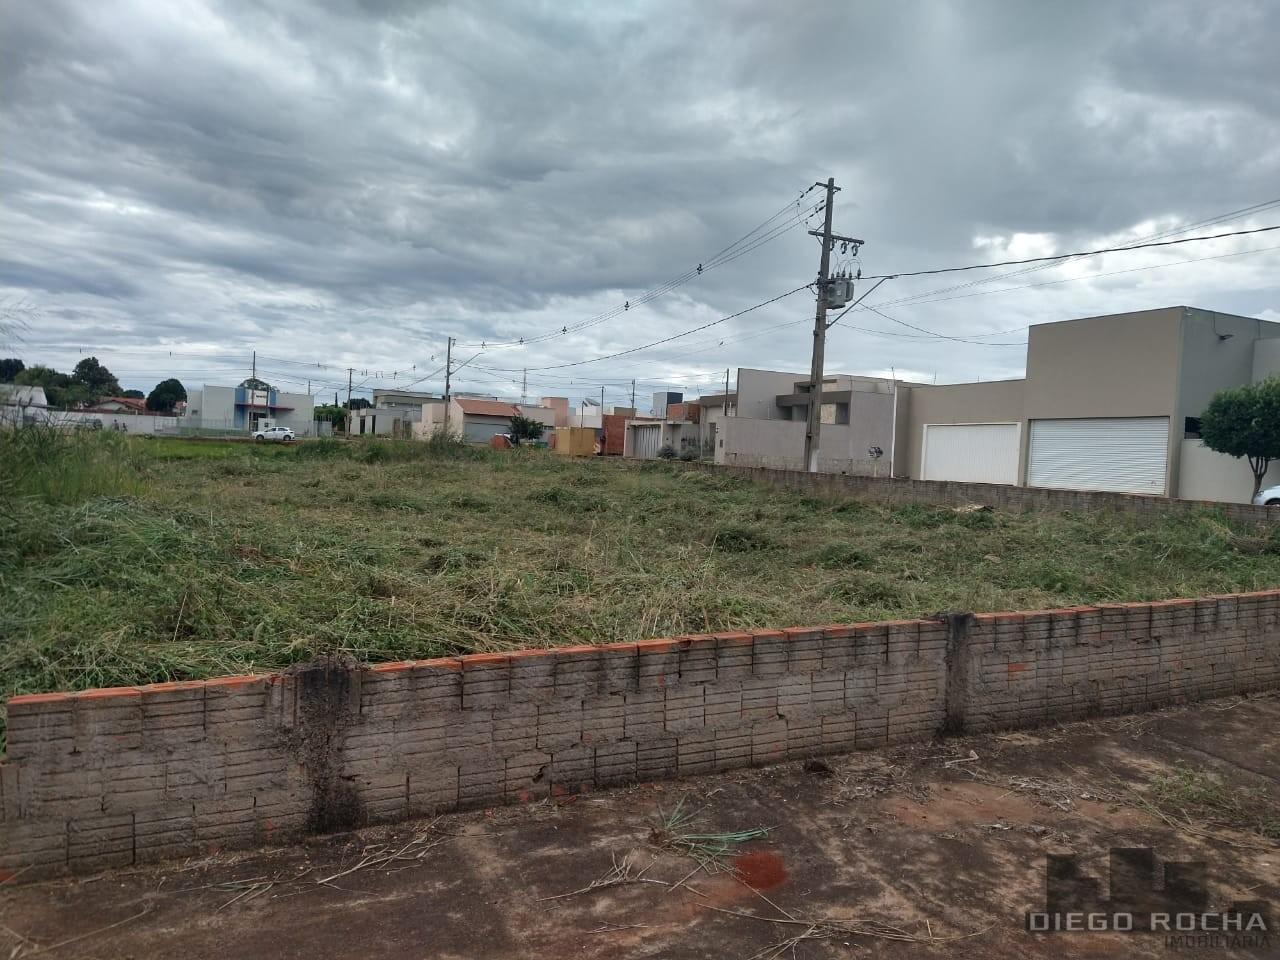 imoveis/2021/03/terreno-venda-2619-2619-3-1615583813.jpg